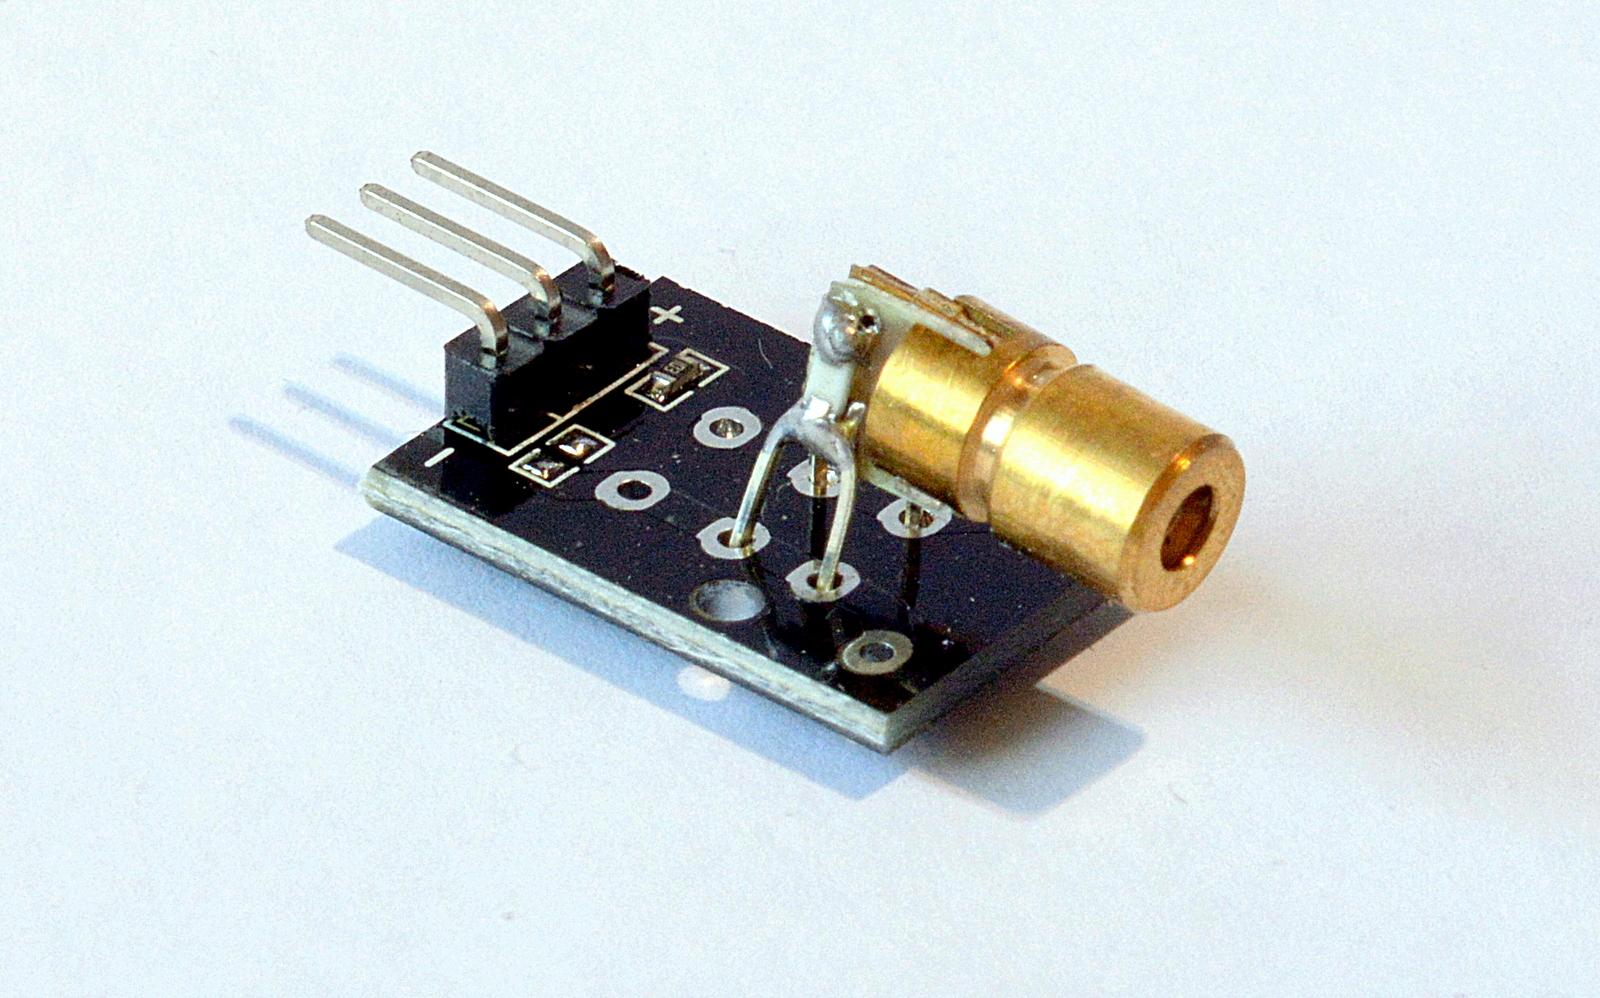 KY-008 Laser Pointer Sensor Transmitter Modul Module Arduino Raspberry Pi